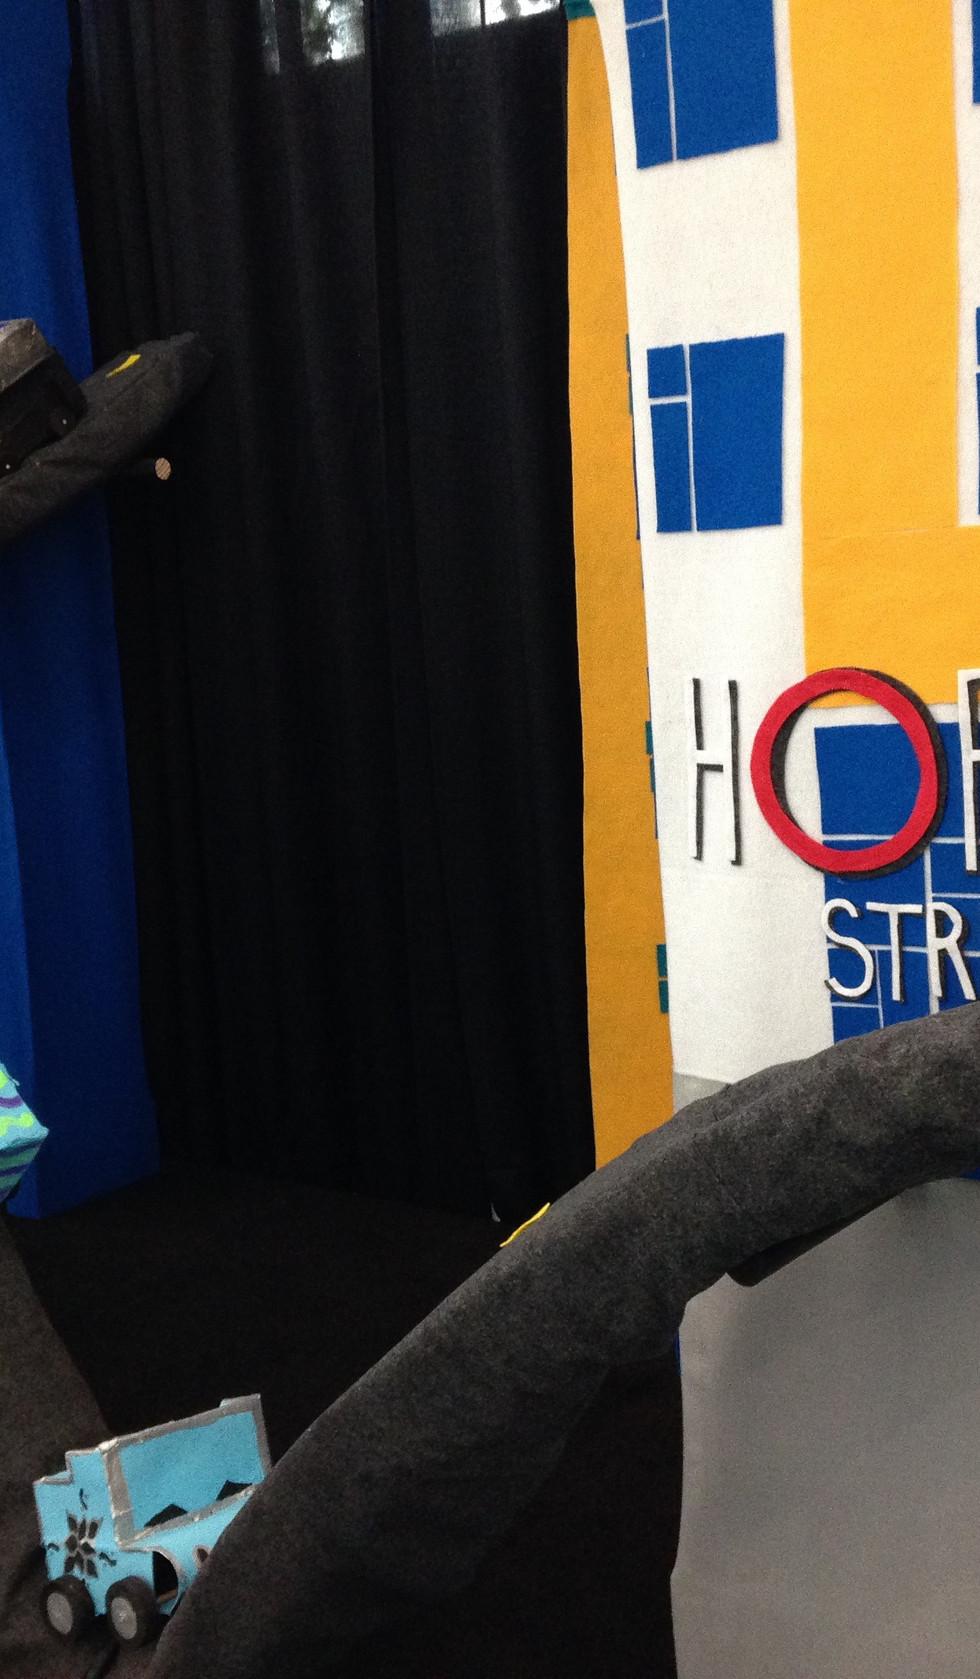 LA Auto Show/ Hope Street Kid's Exhibition